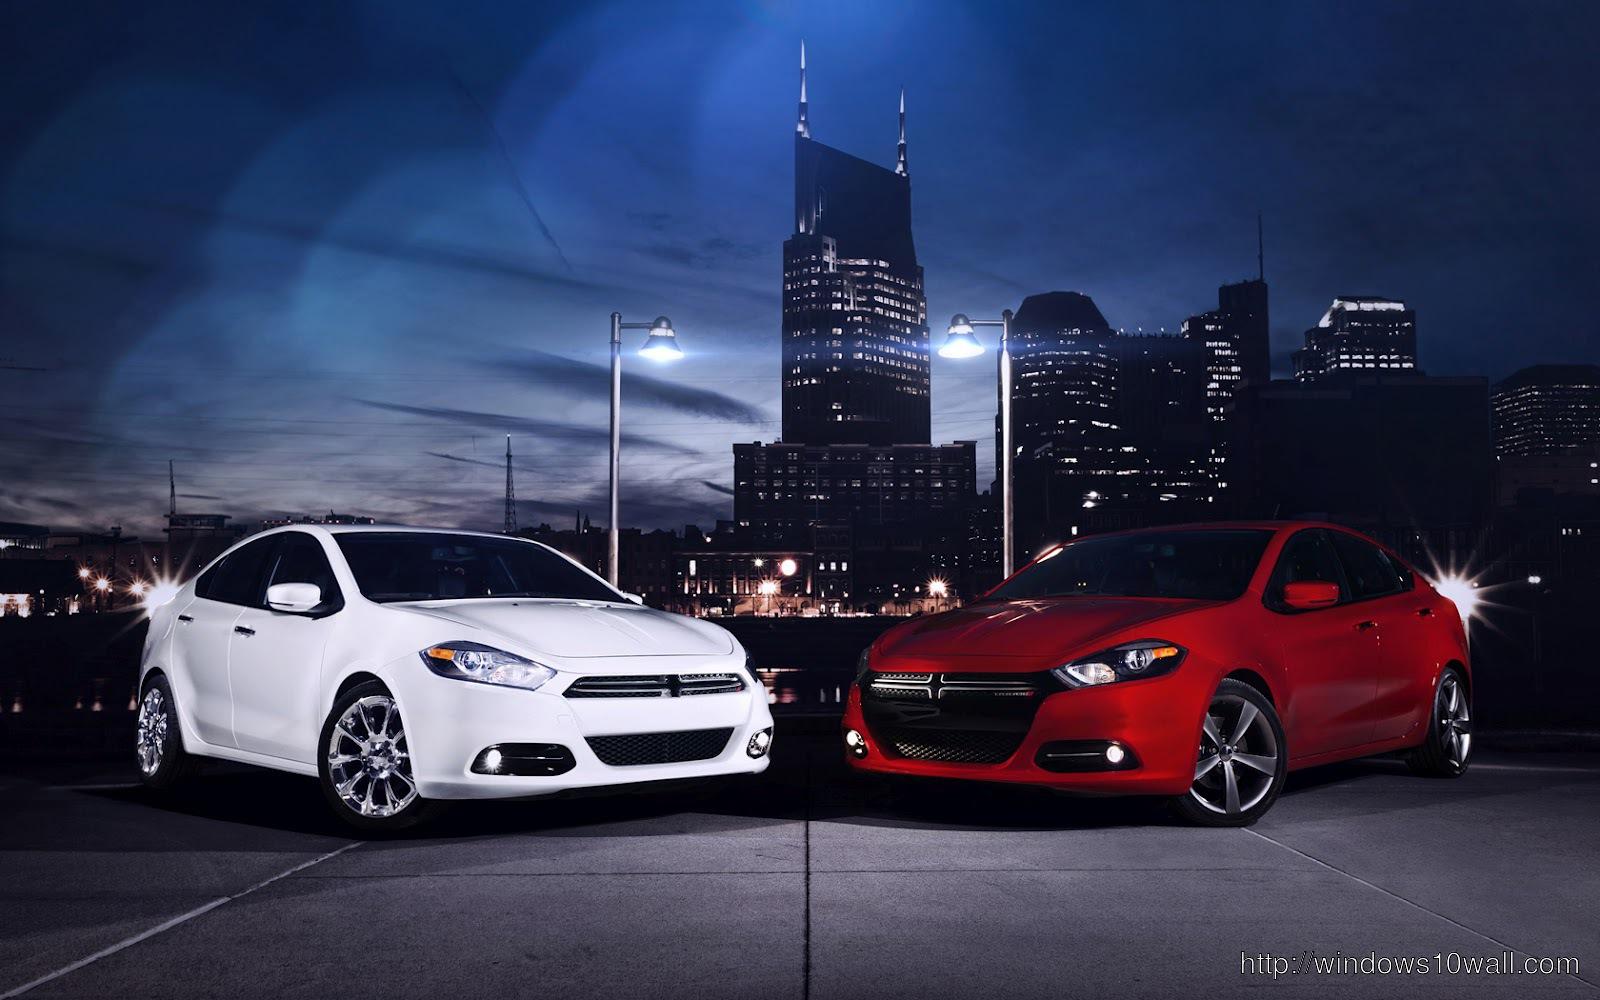 Red n White 2013 Dodge Dart Background Wallpaper